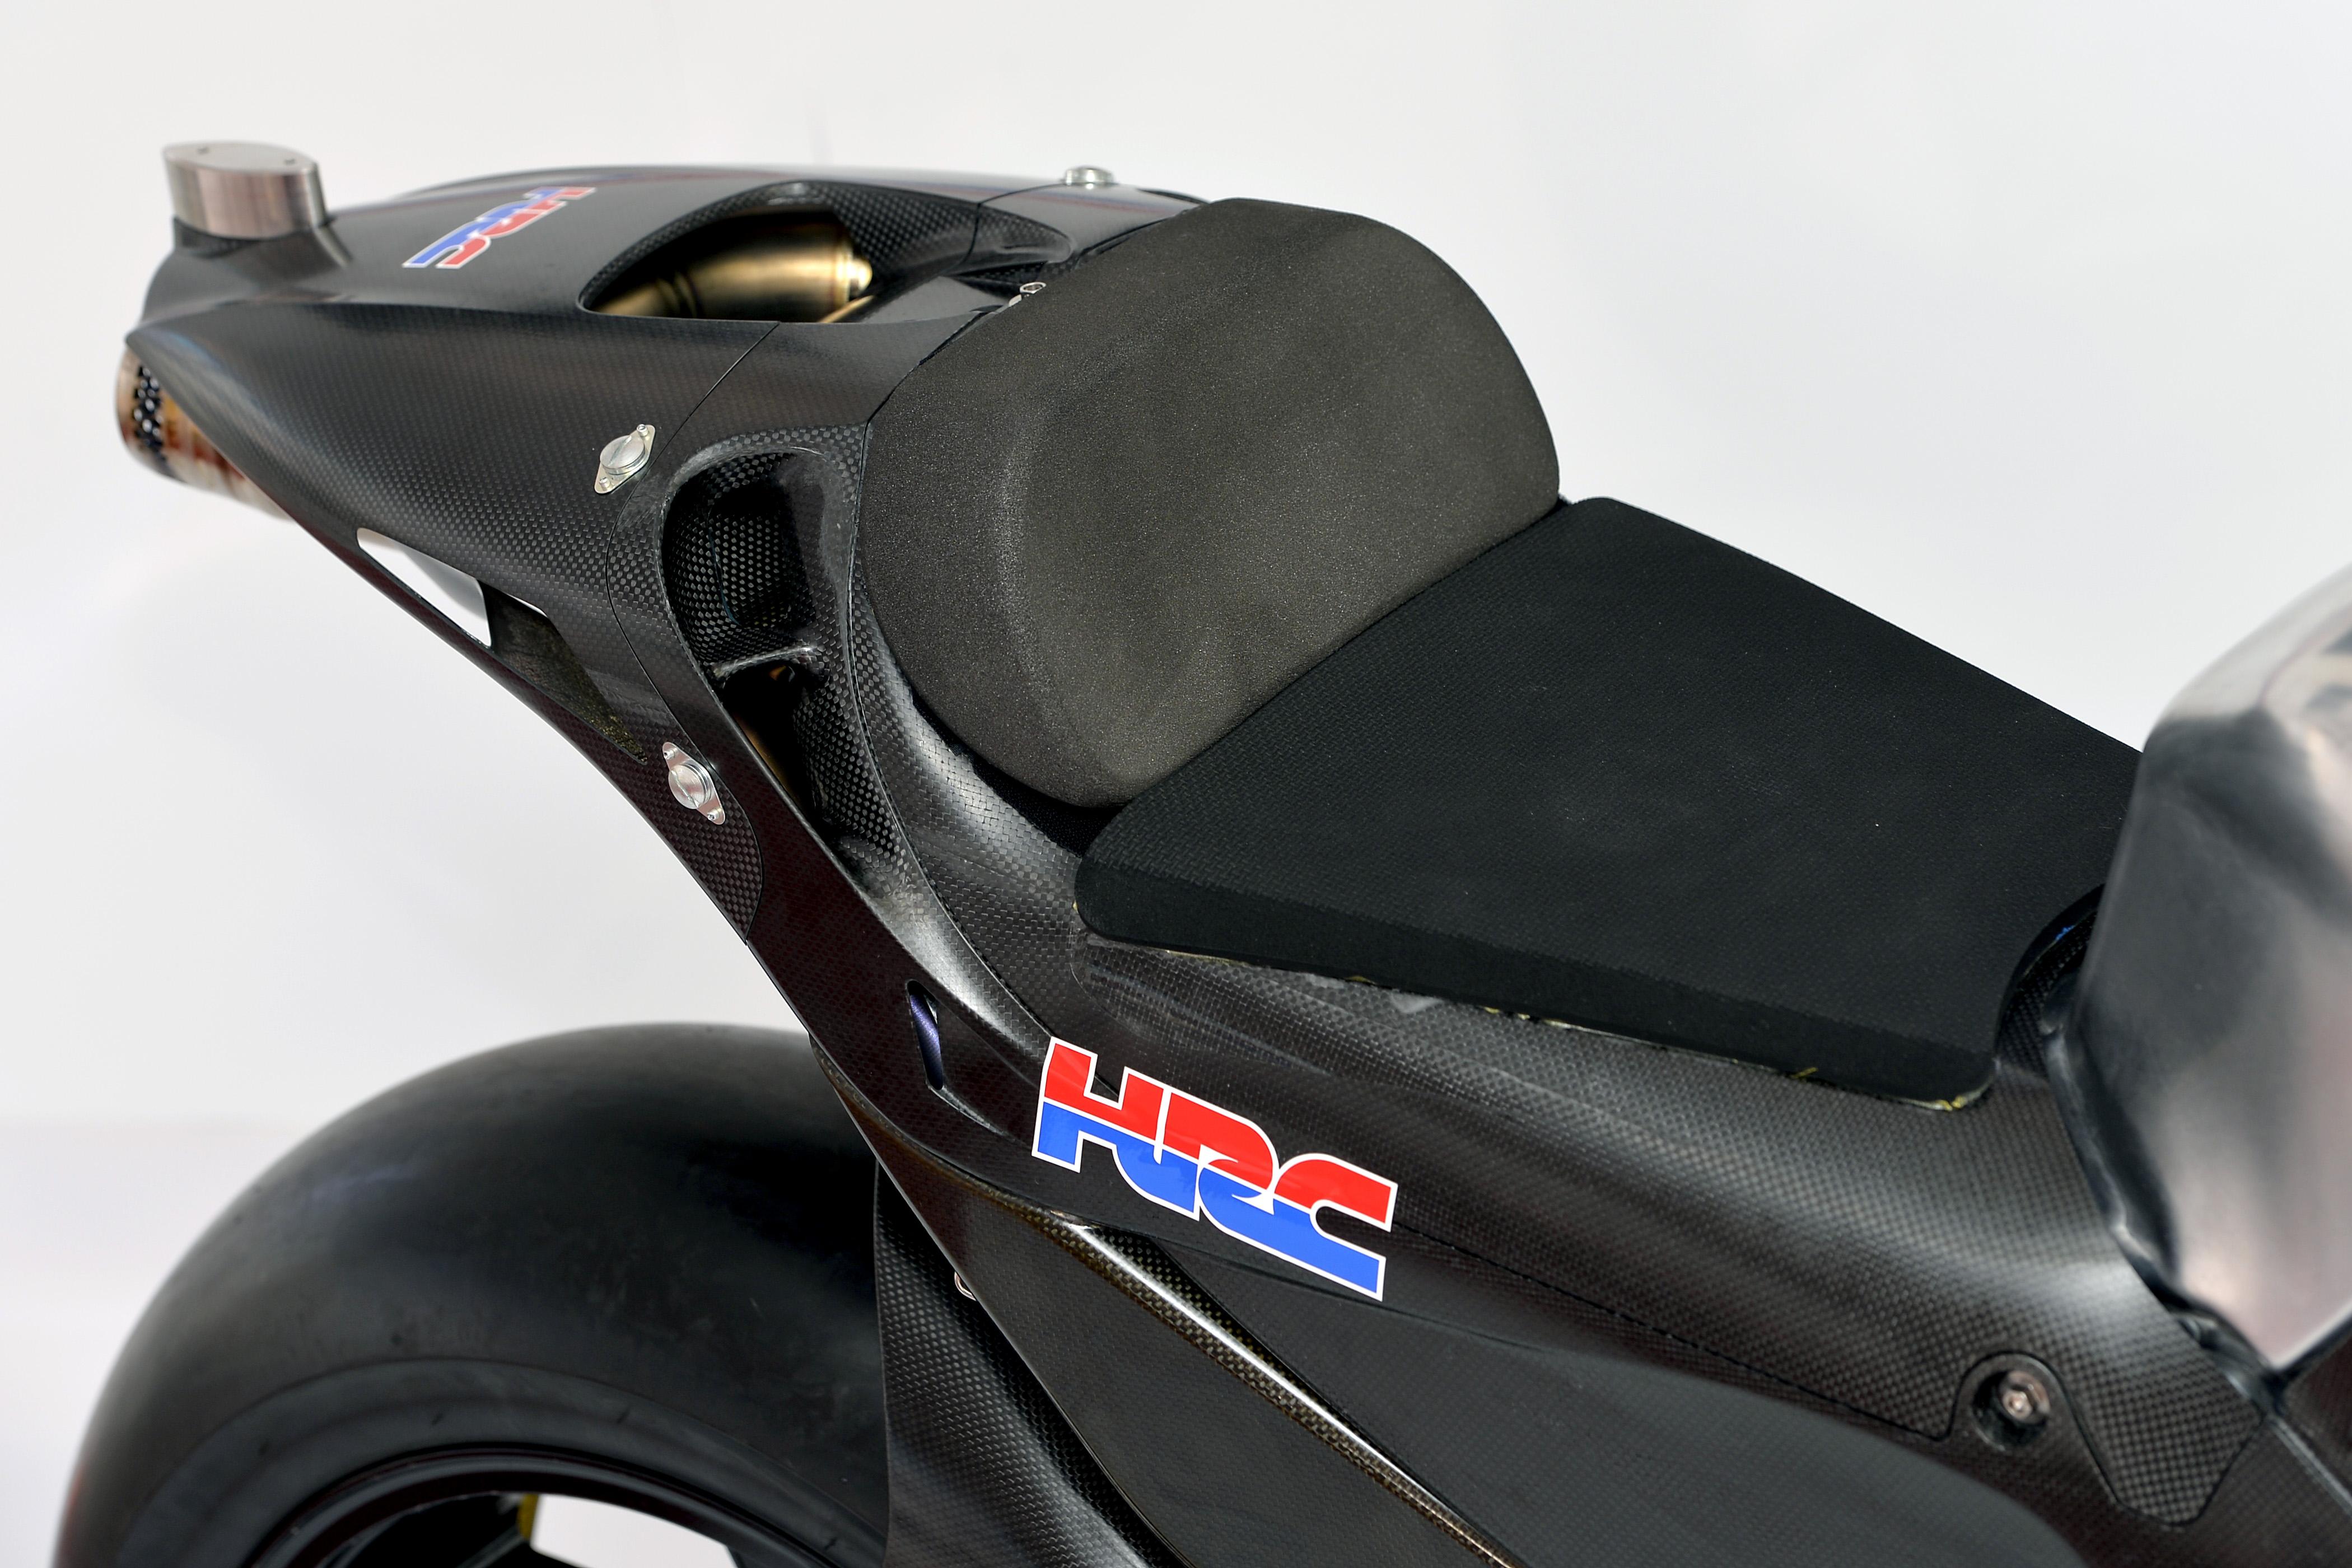 honda_rcv1000r_motogp_production_racer_www_racemoto_com_014